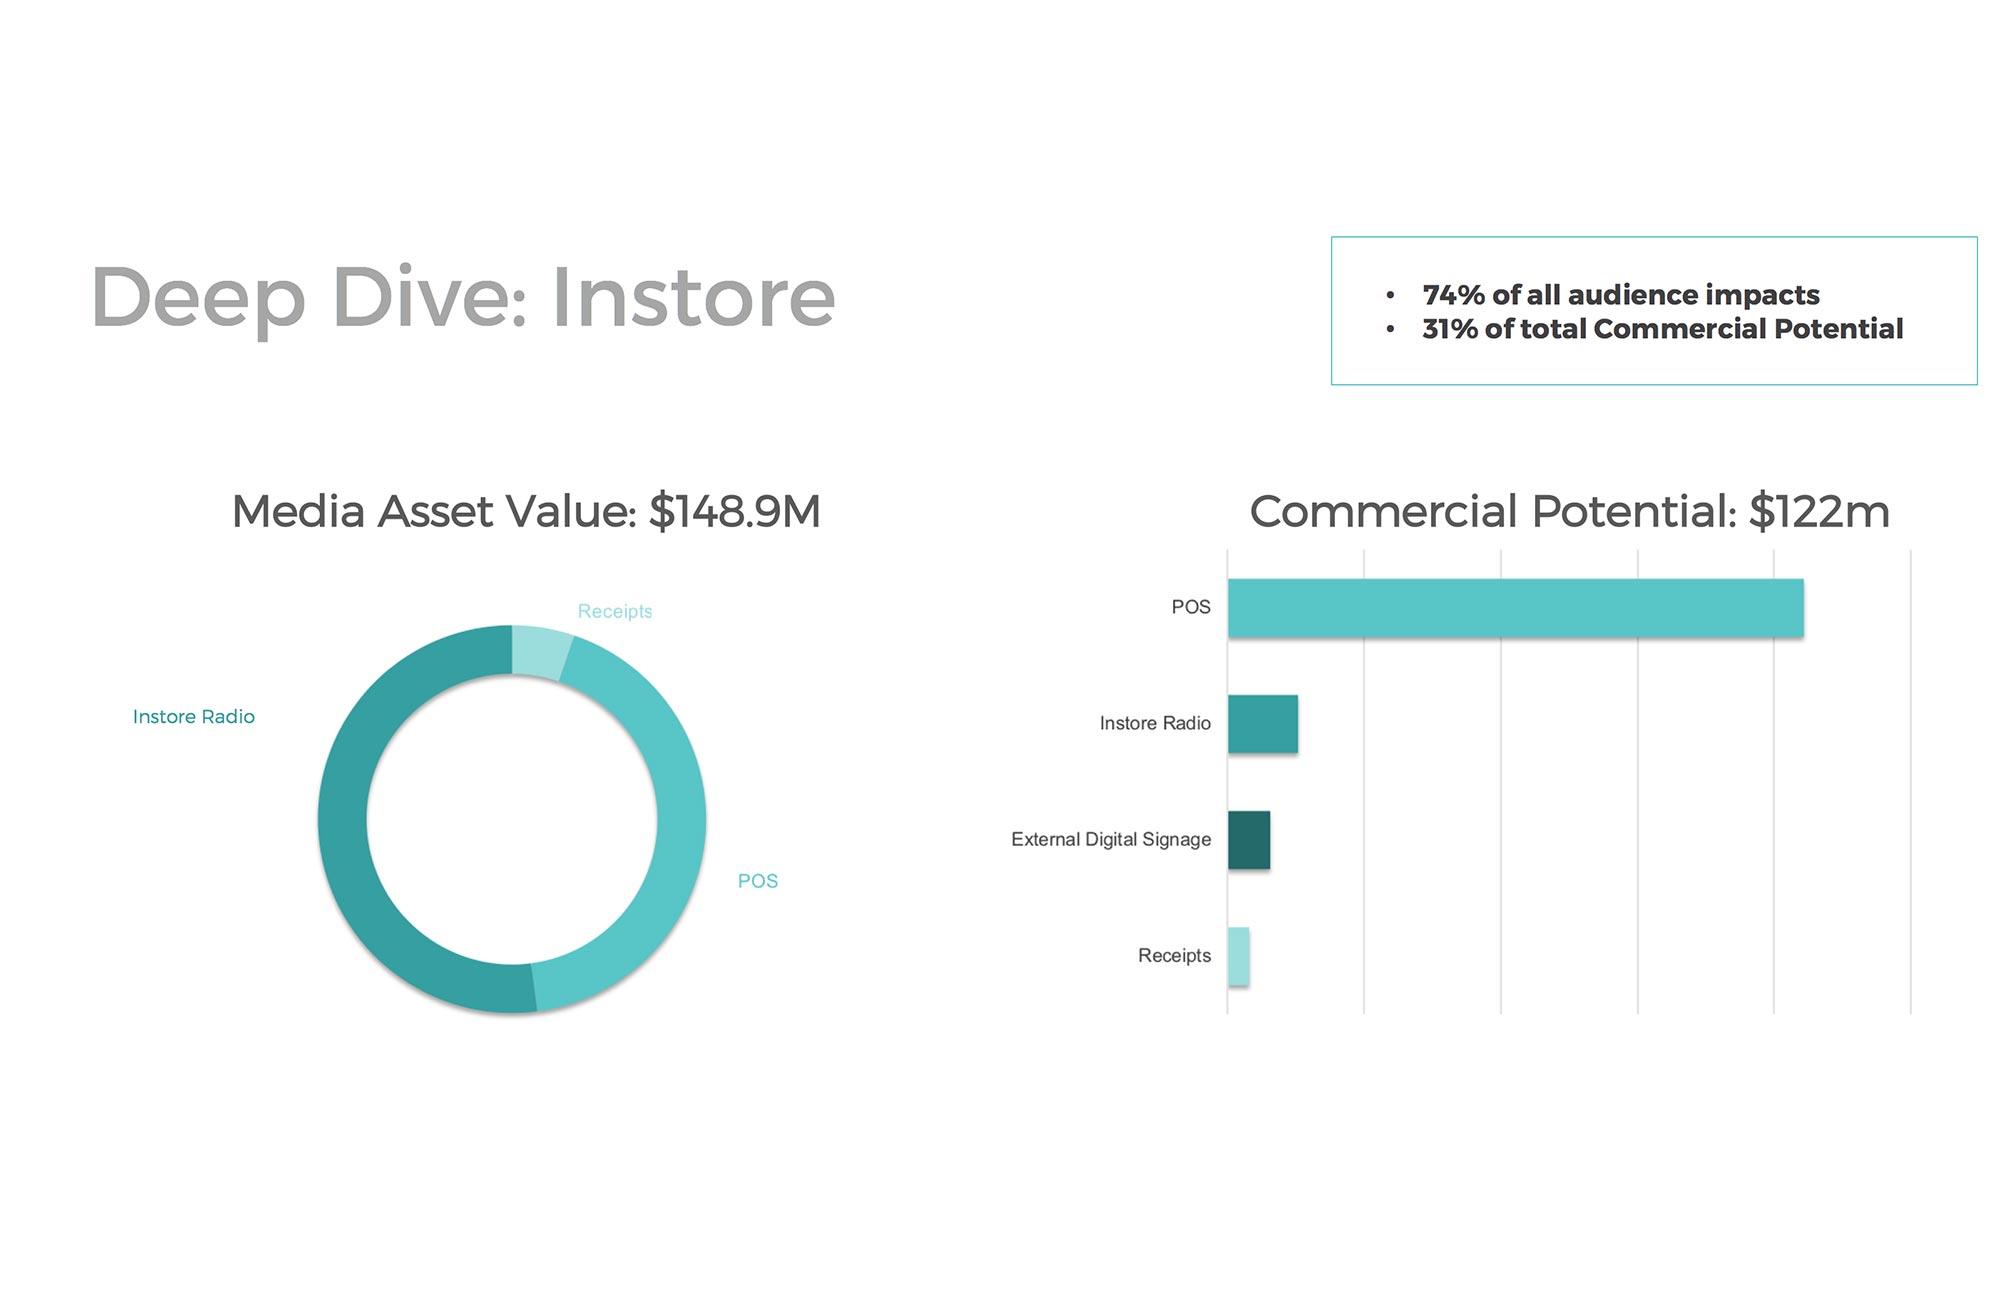 Deep dive into specific asset values